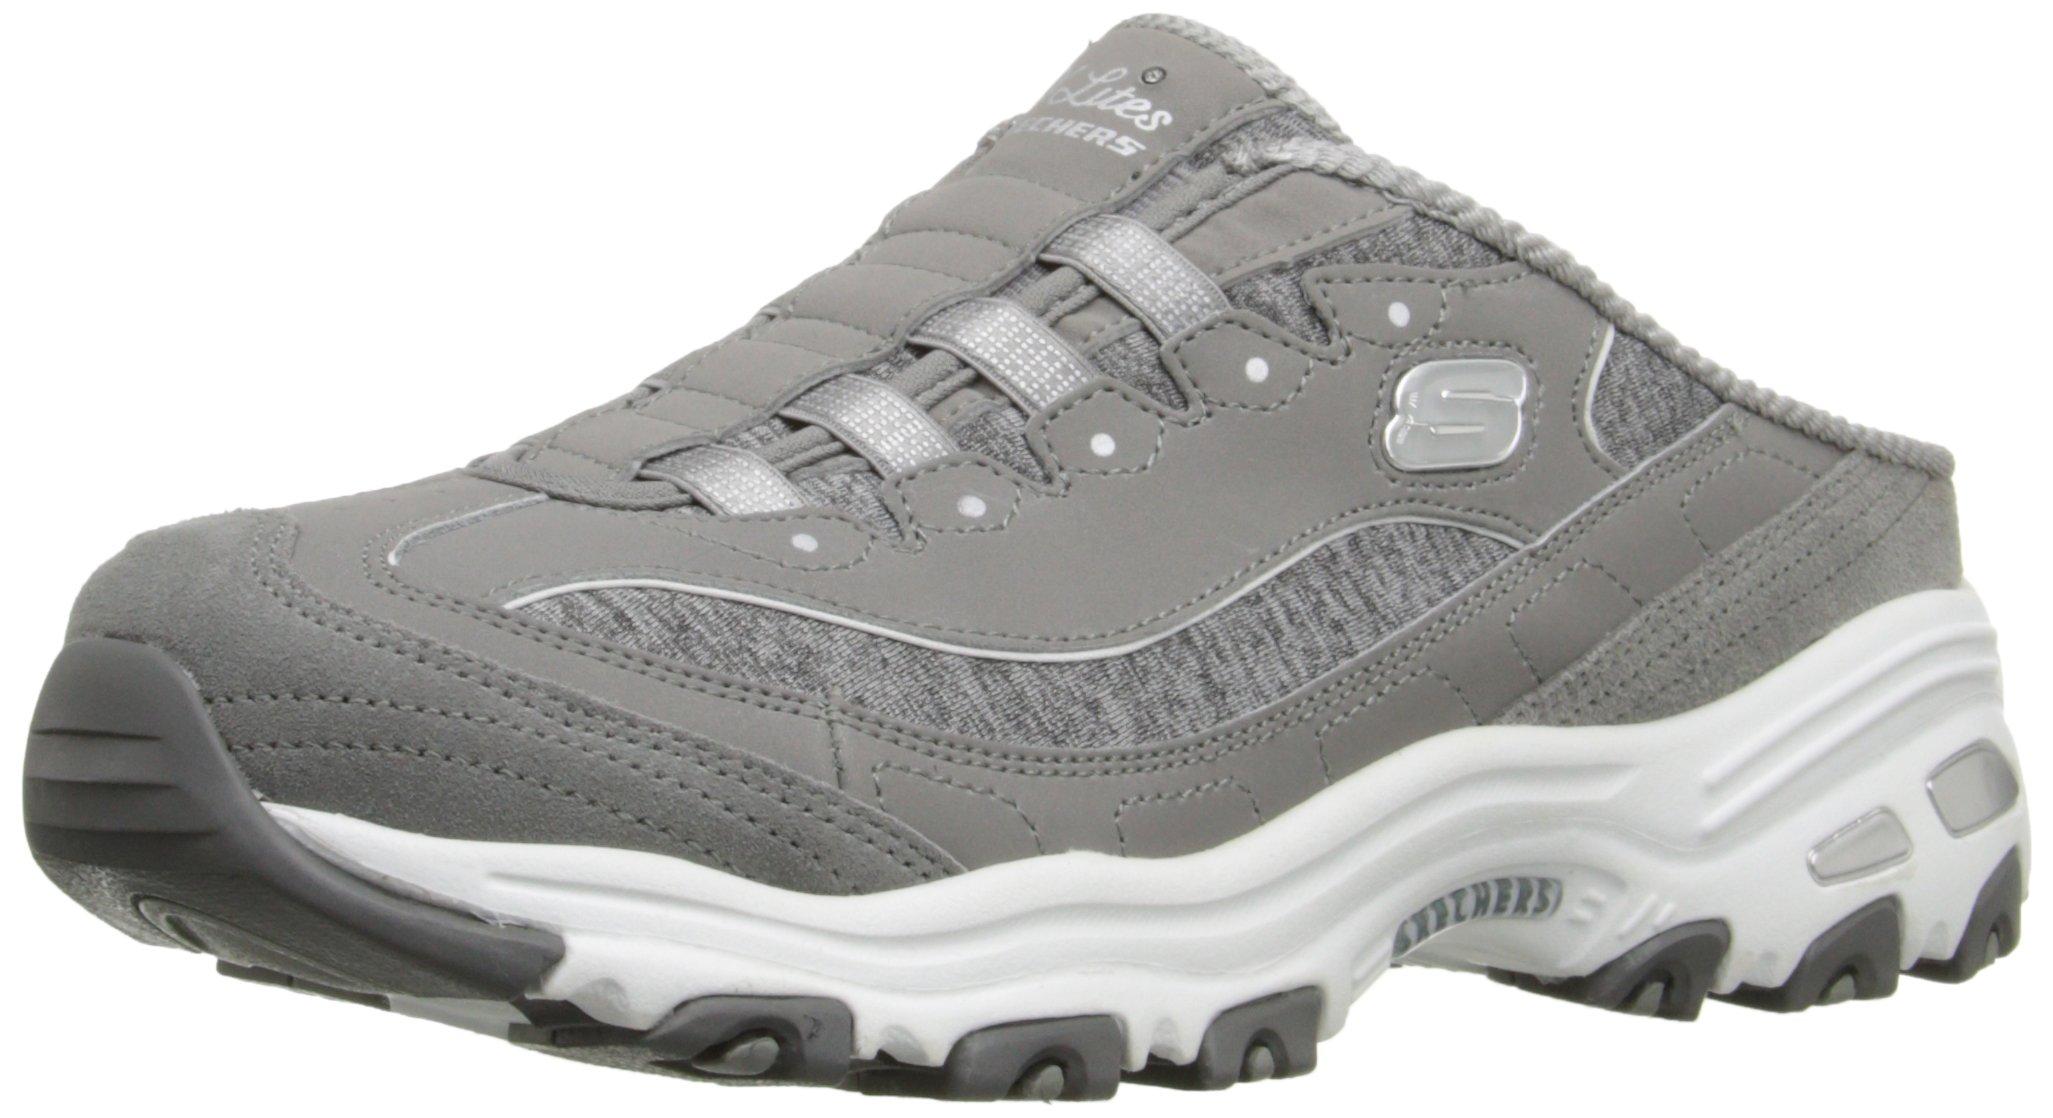 Skechers Sport Women's Resilient Fashion Sneaker, Gray/White, 9 M US